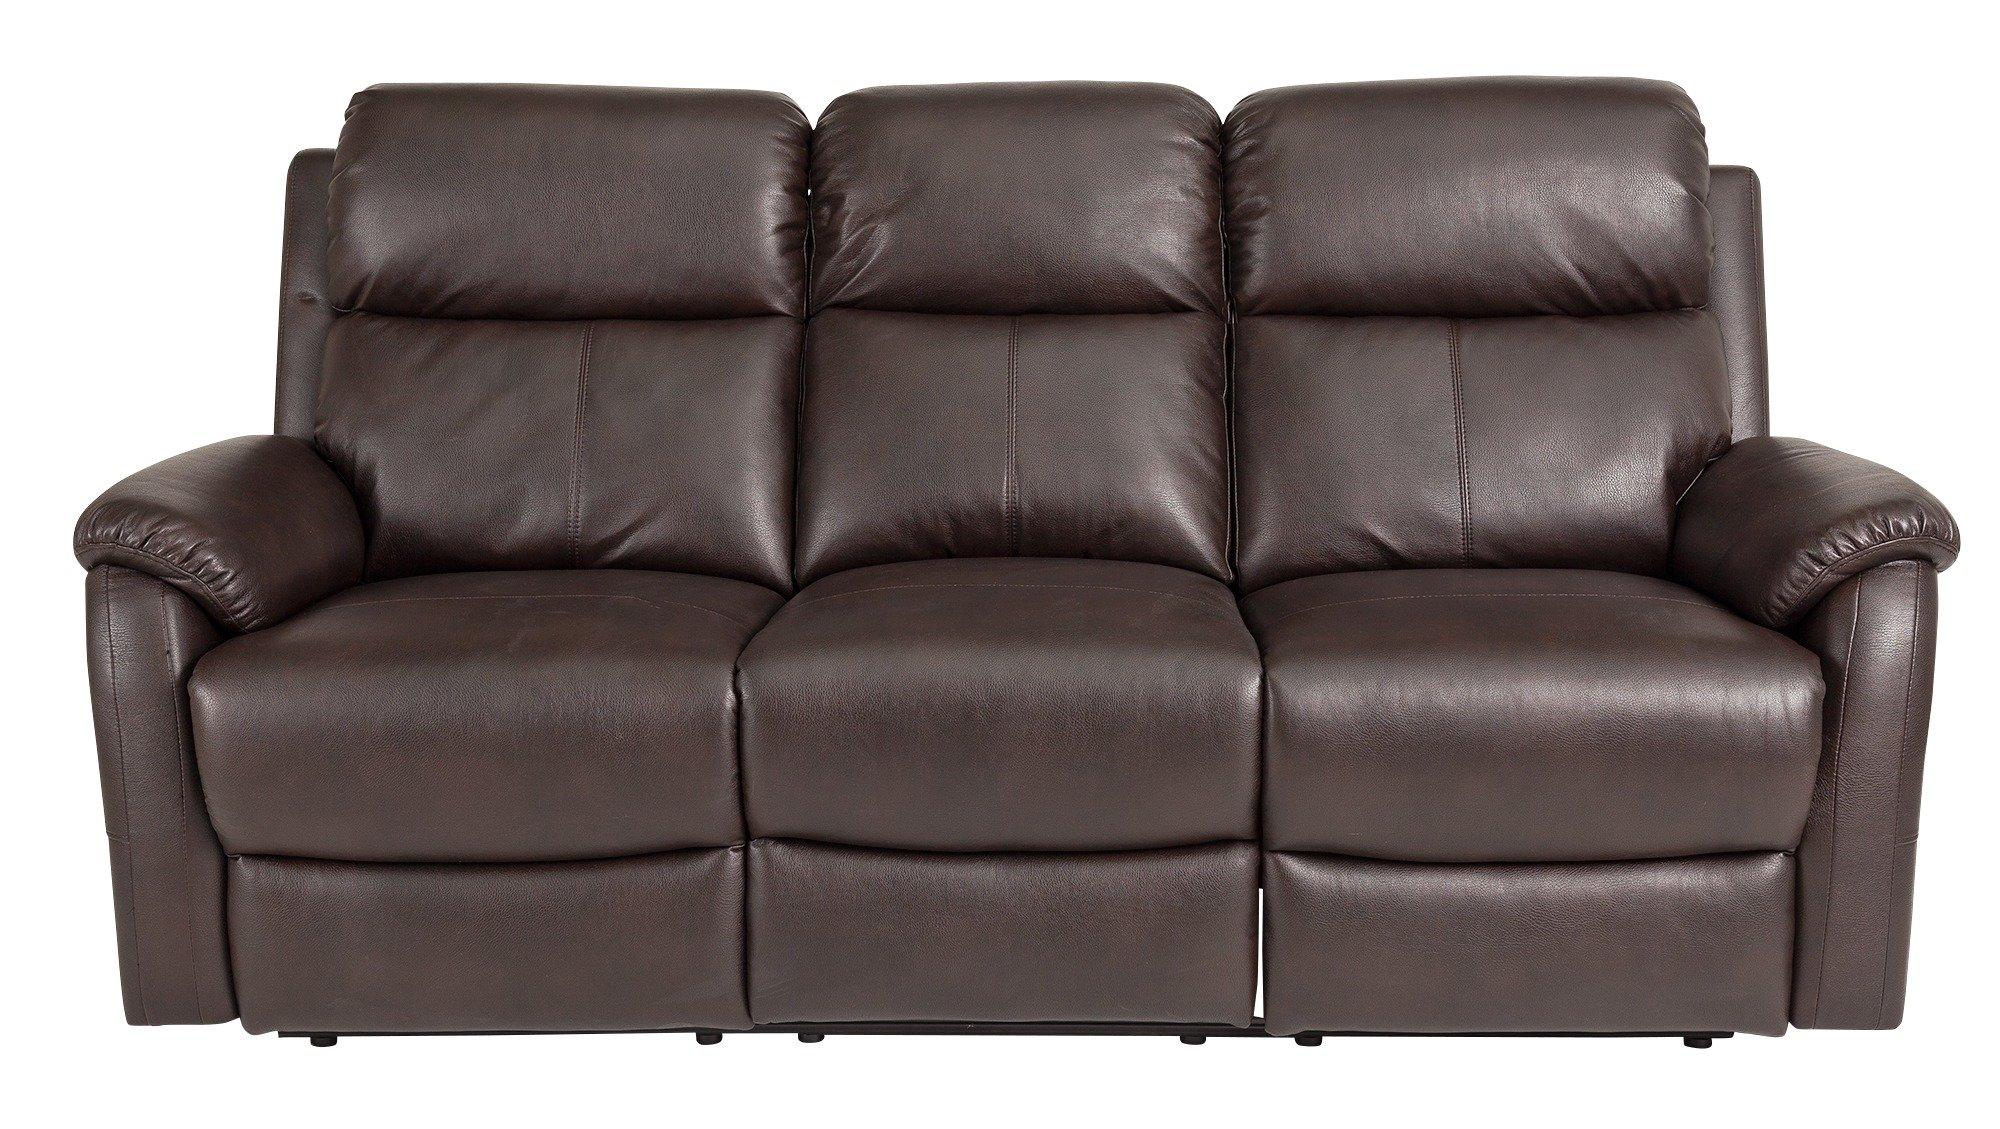 sale on home tyler 3 seater leather effect recliner. Black Bedroom Furniture Sets. Home Design Ideas